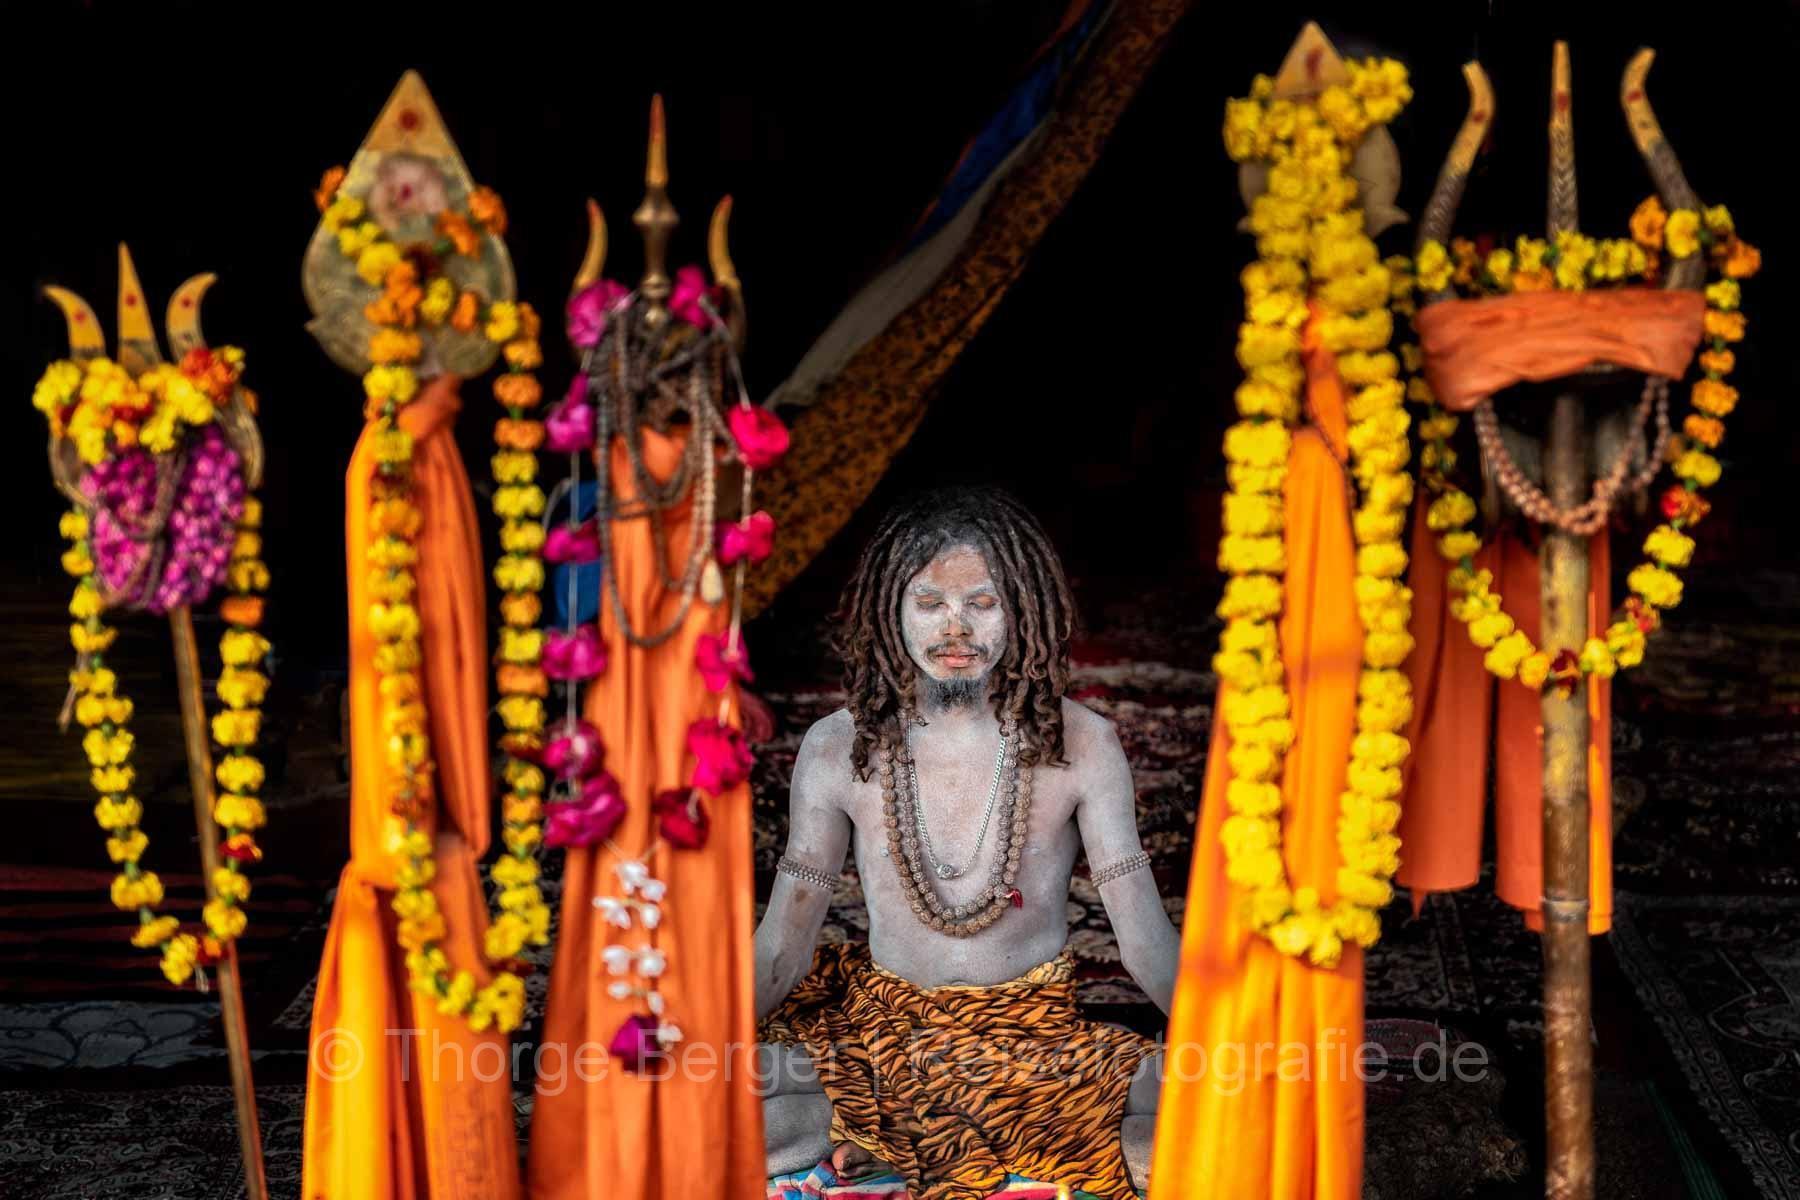 Meditierender Sadhu bei der Ardth Kumbh Mela 2019 in Prayagraj